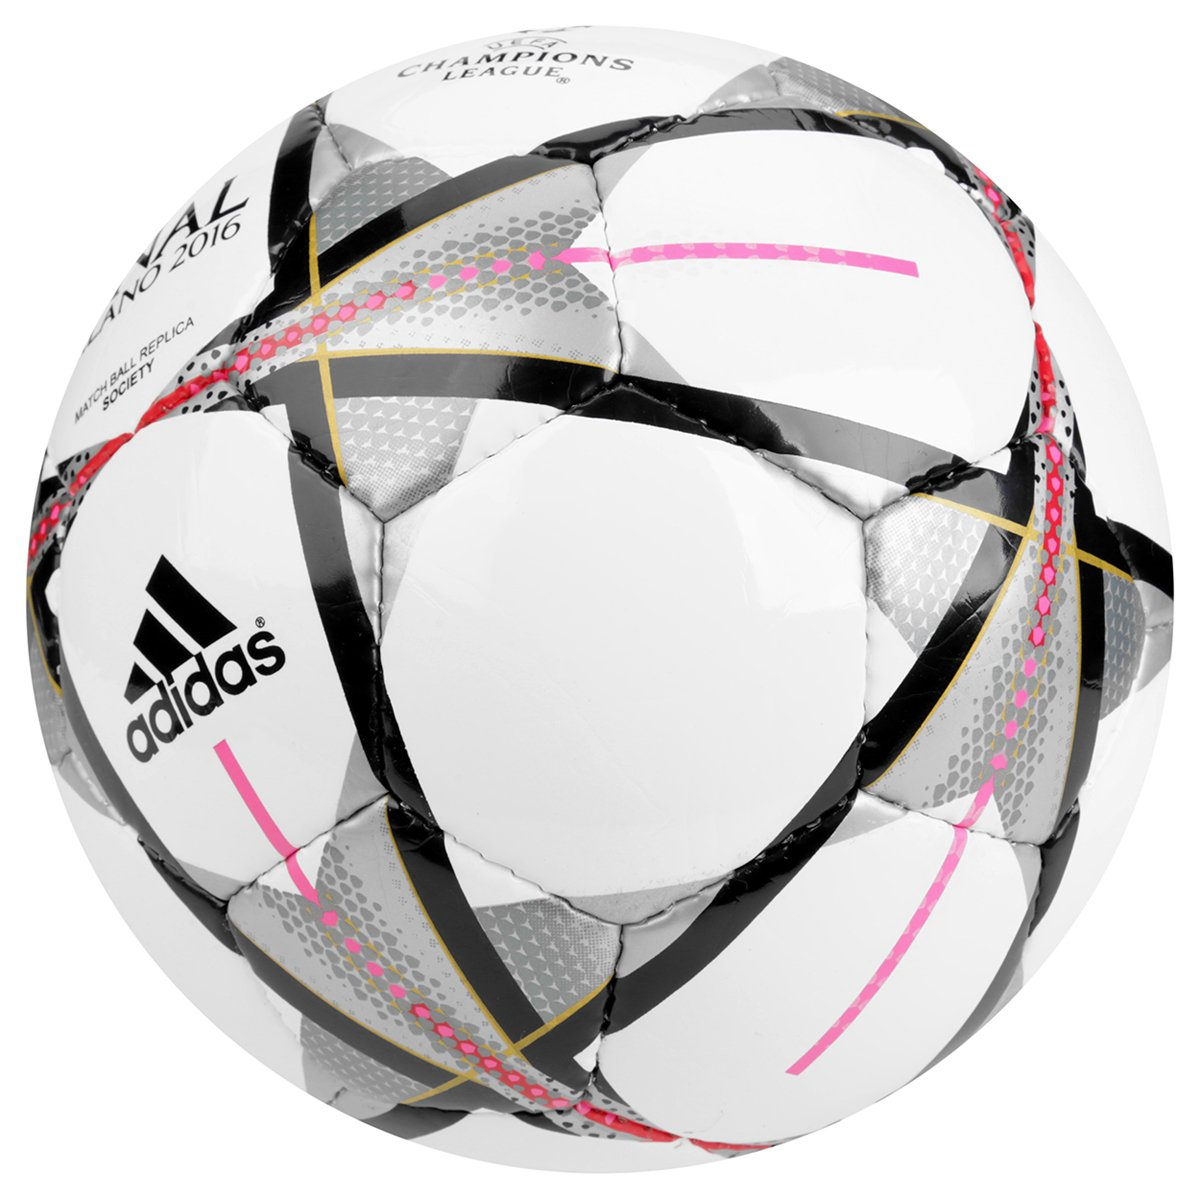 030dffb344 Bola Futebol Society Adidas Finale Milano - Compre Agora